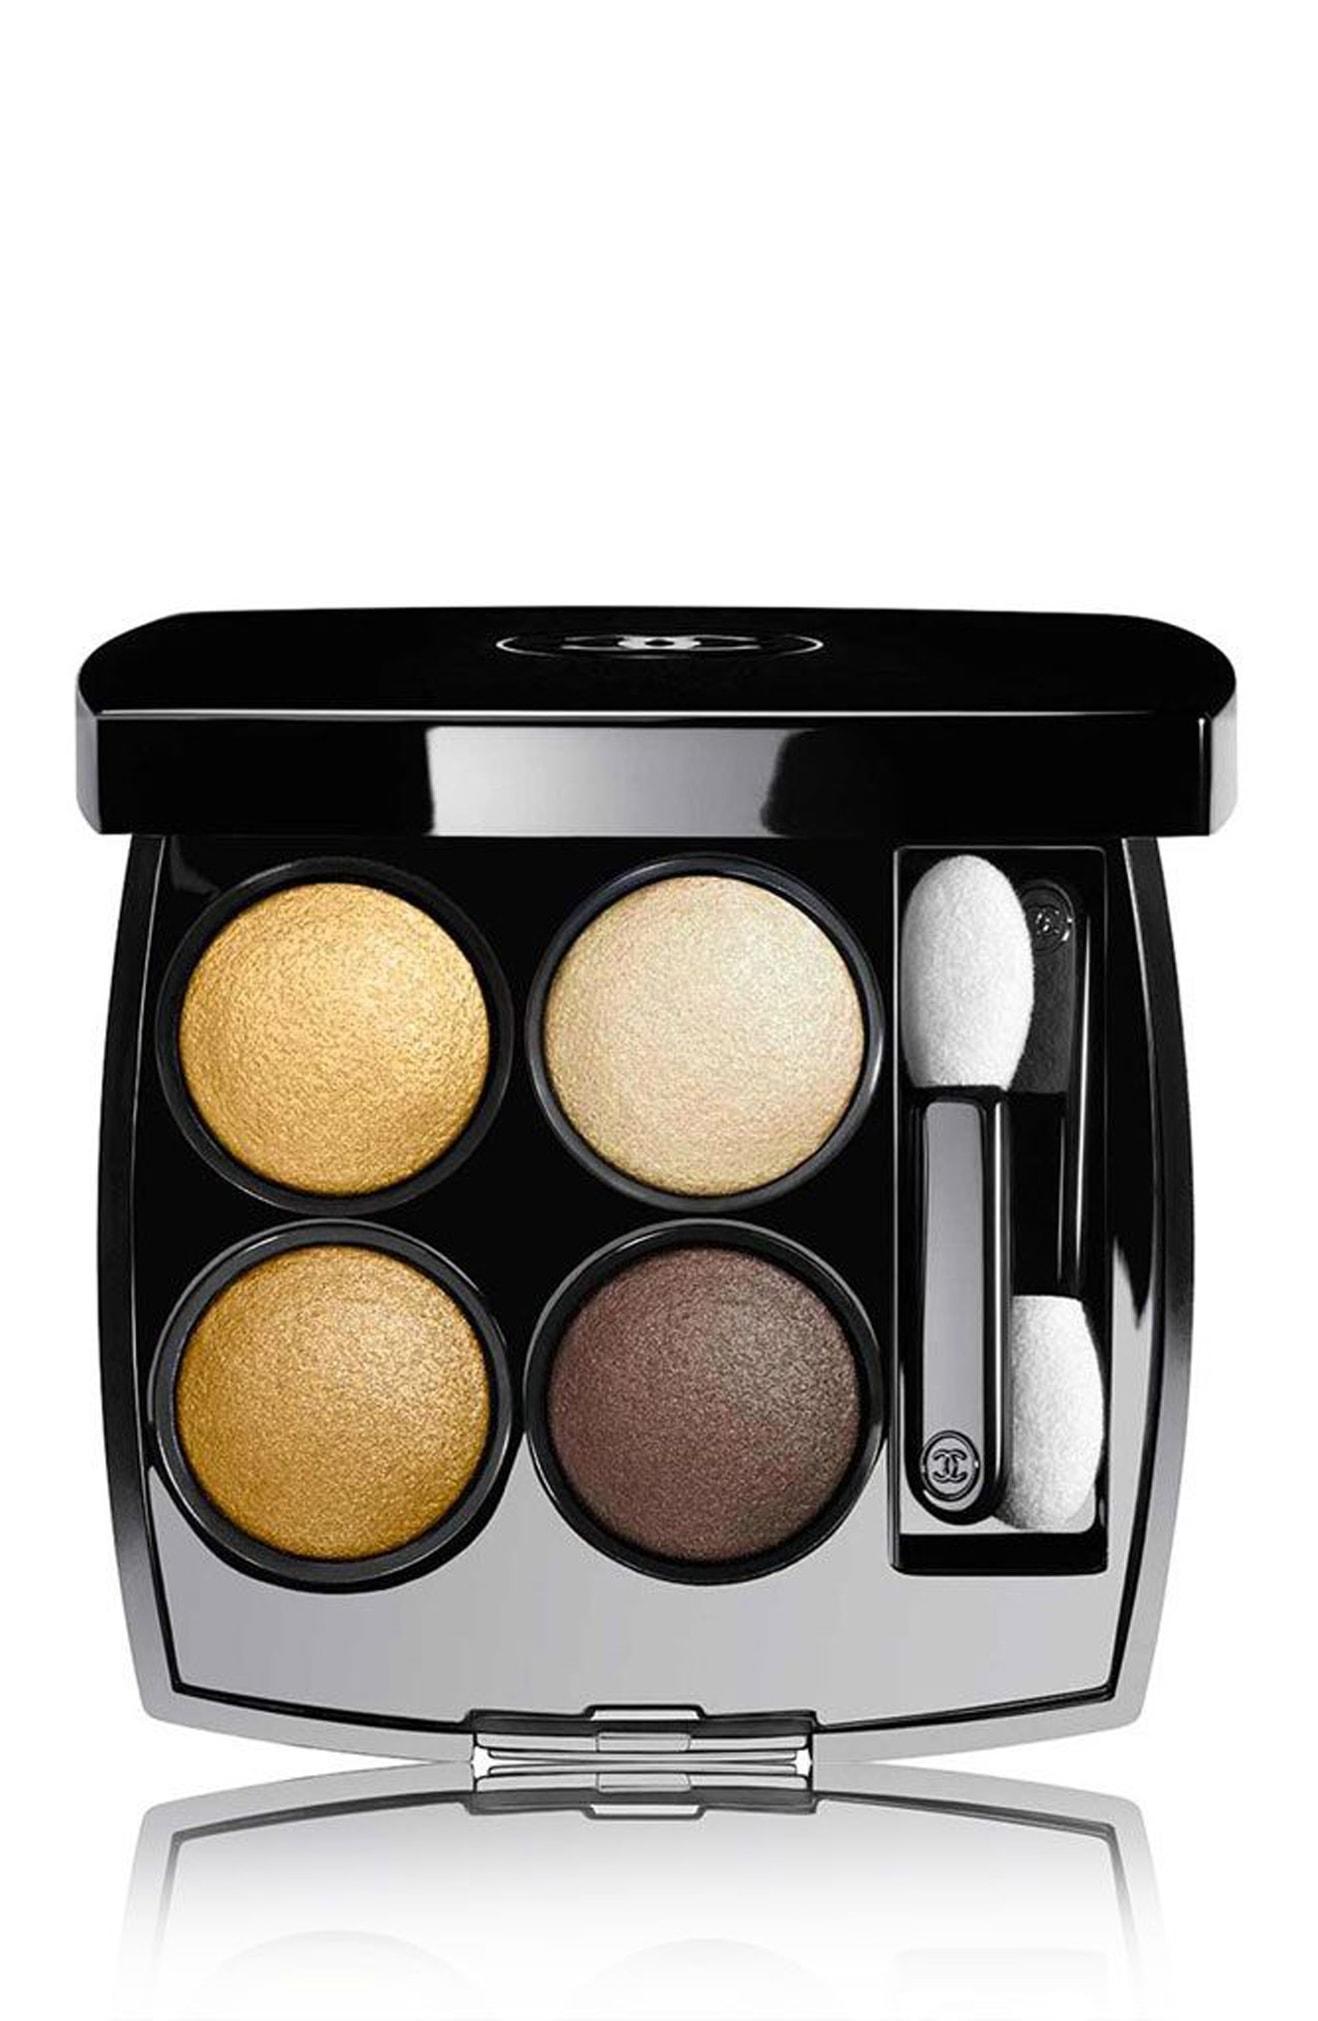 Chanel Les Quatre Ombres Quadra Eyeshadow Excentriques